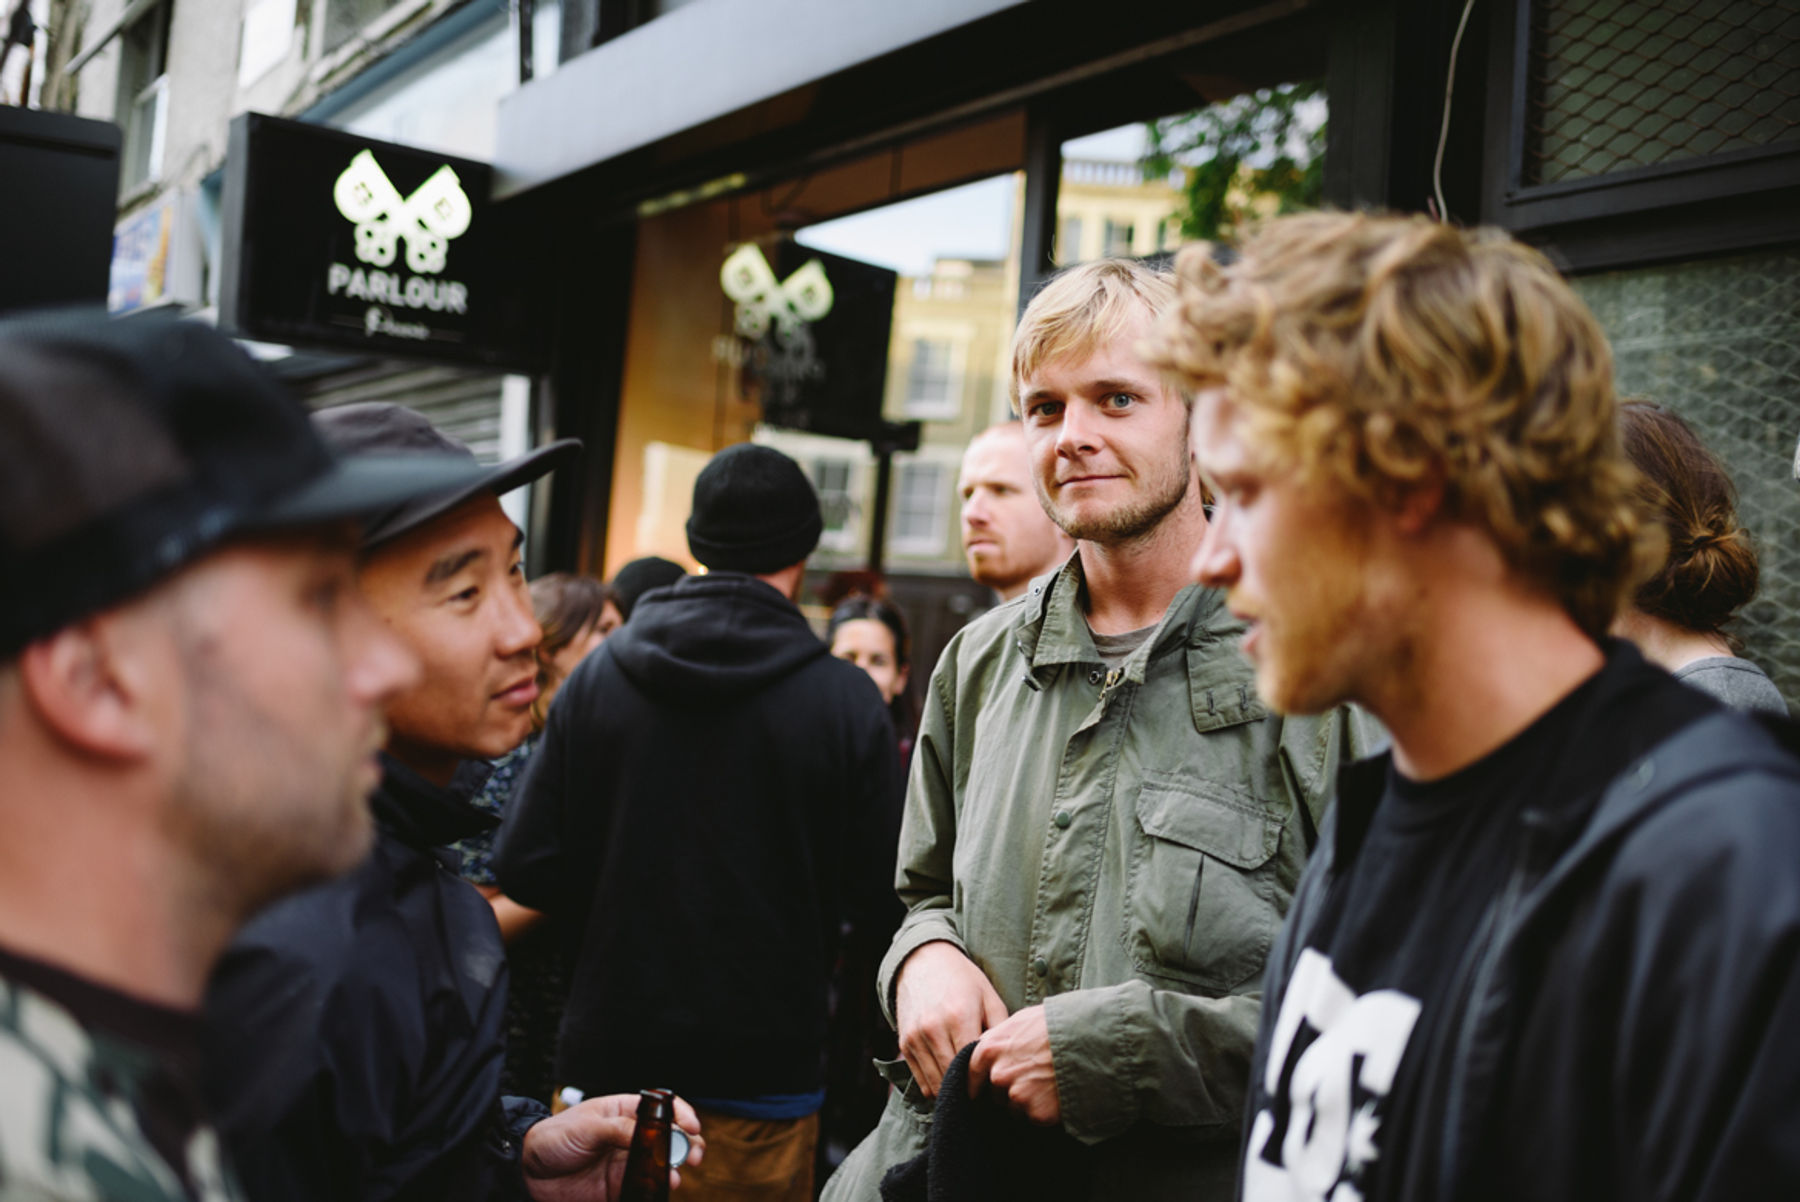 _IHC3871e-Madars-Apse-Wes-Kremer-DC-Special-Delivery-Skate-Tour-BTS-Parlour-Defy-Convention-Exhibition-London-May-2015-Photographer-Maksim-Kalanep